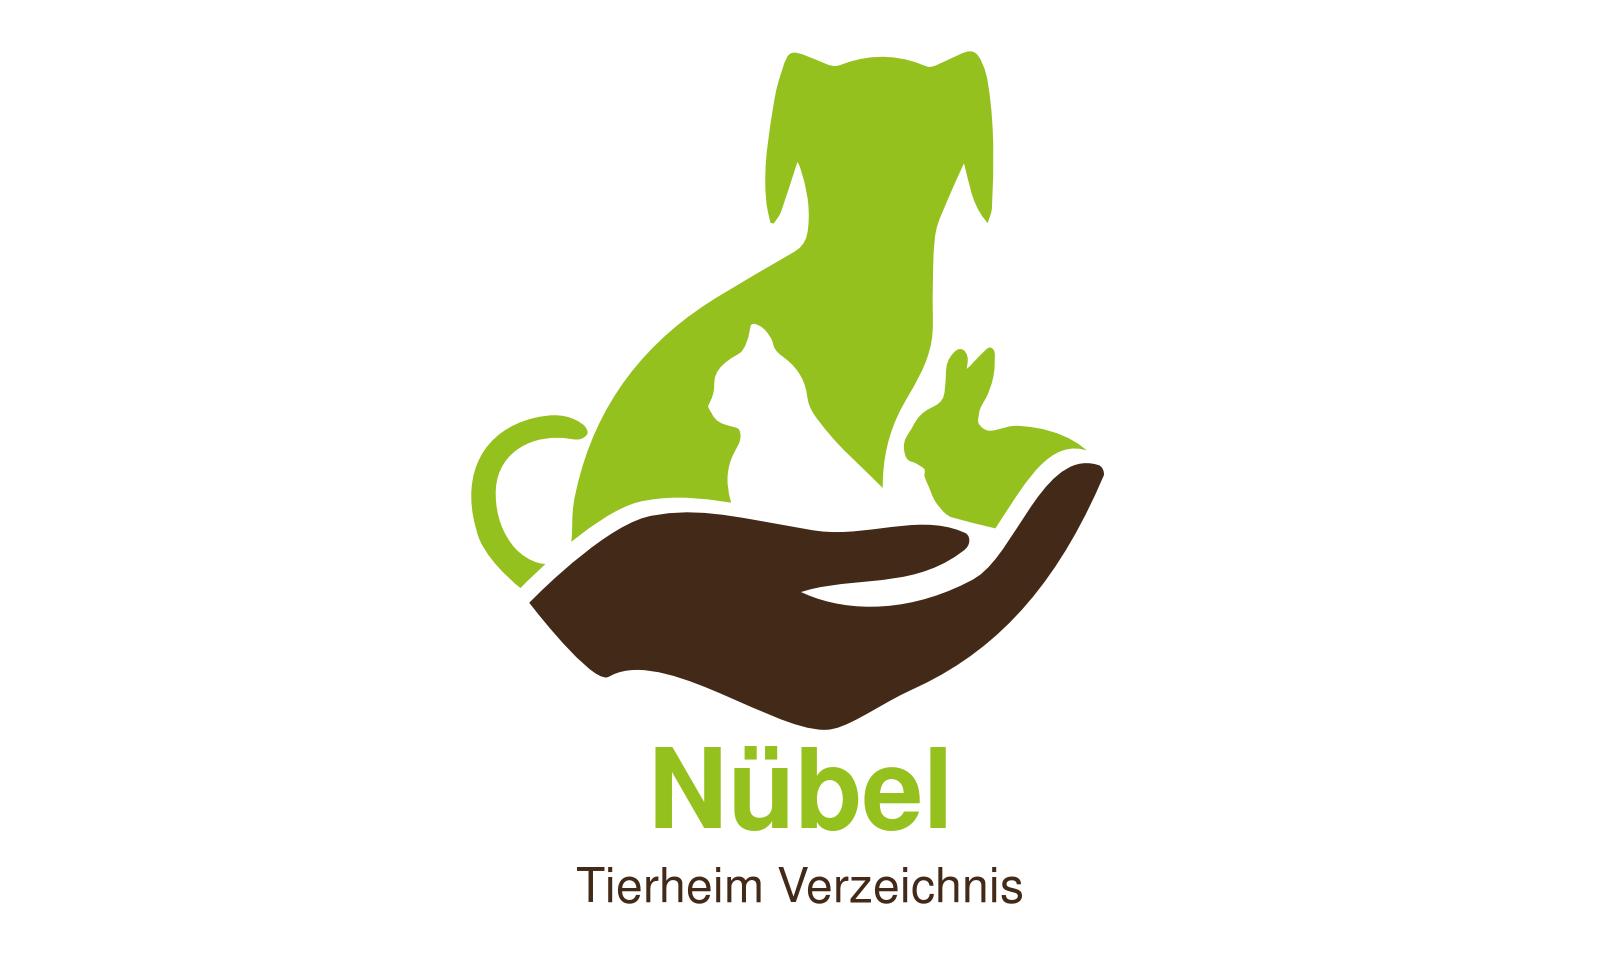 Tierheim Nübel